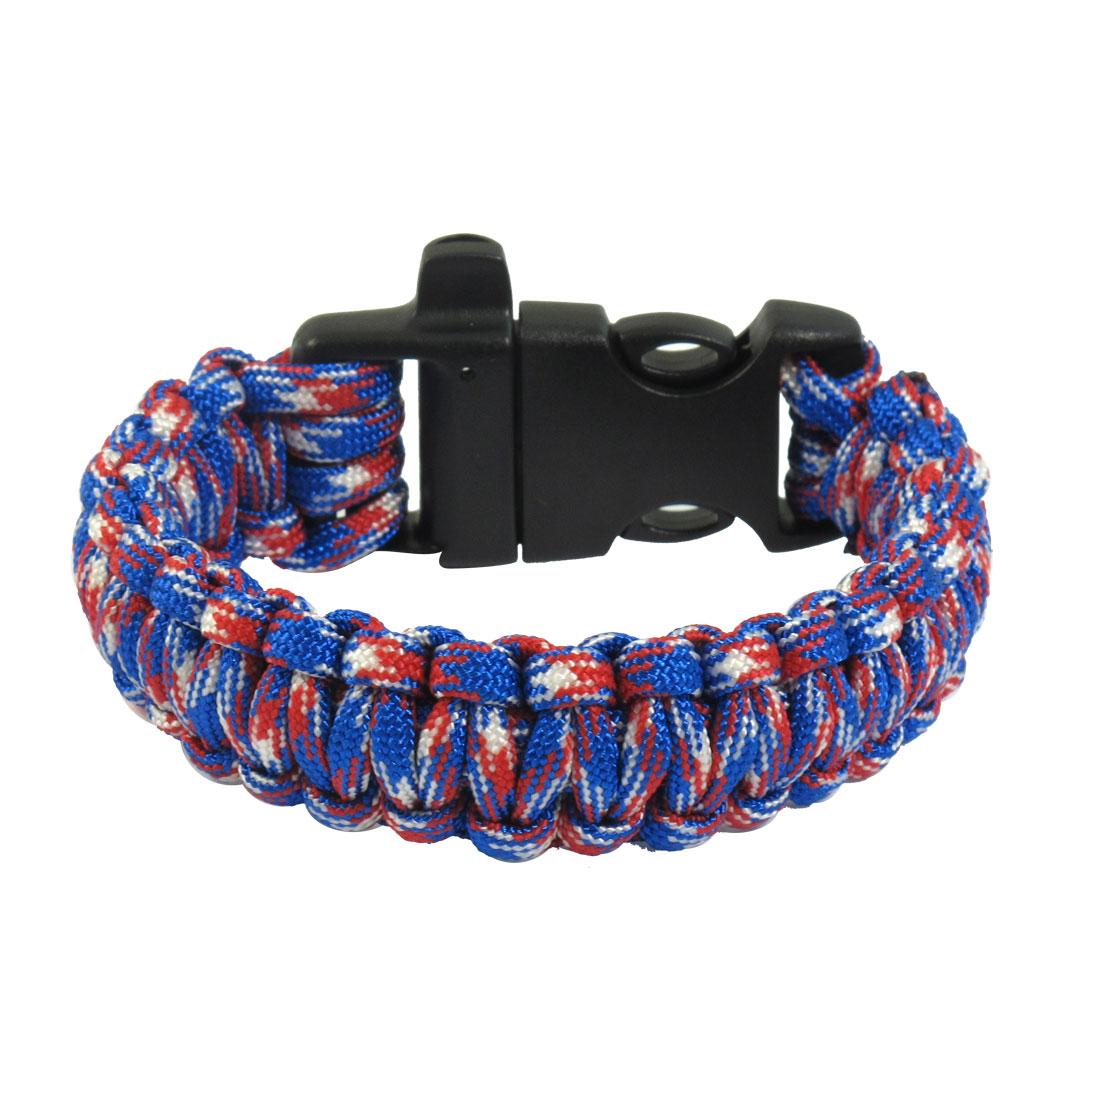 Whistle Practical Colorful Quick Release Buckle Nylon Survival Bracelet